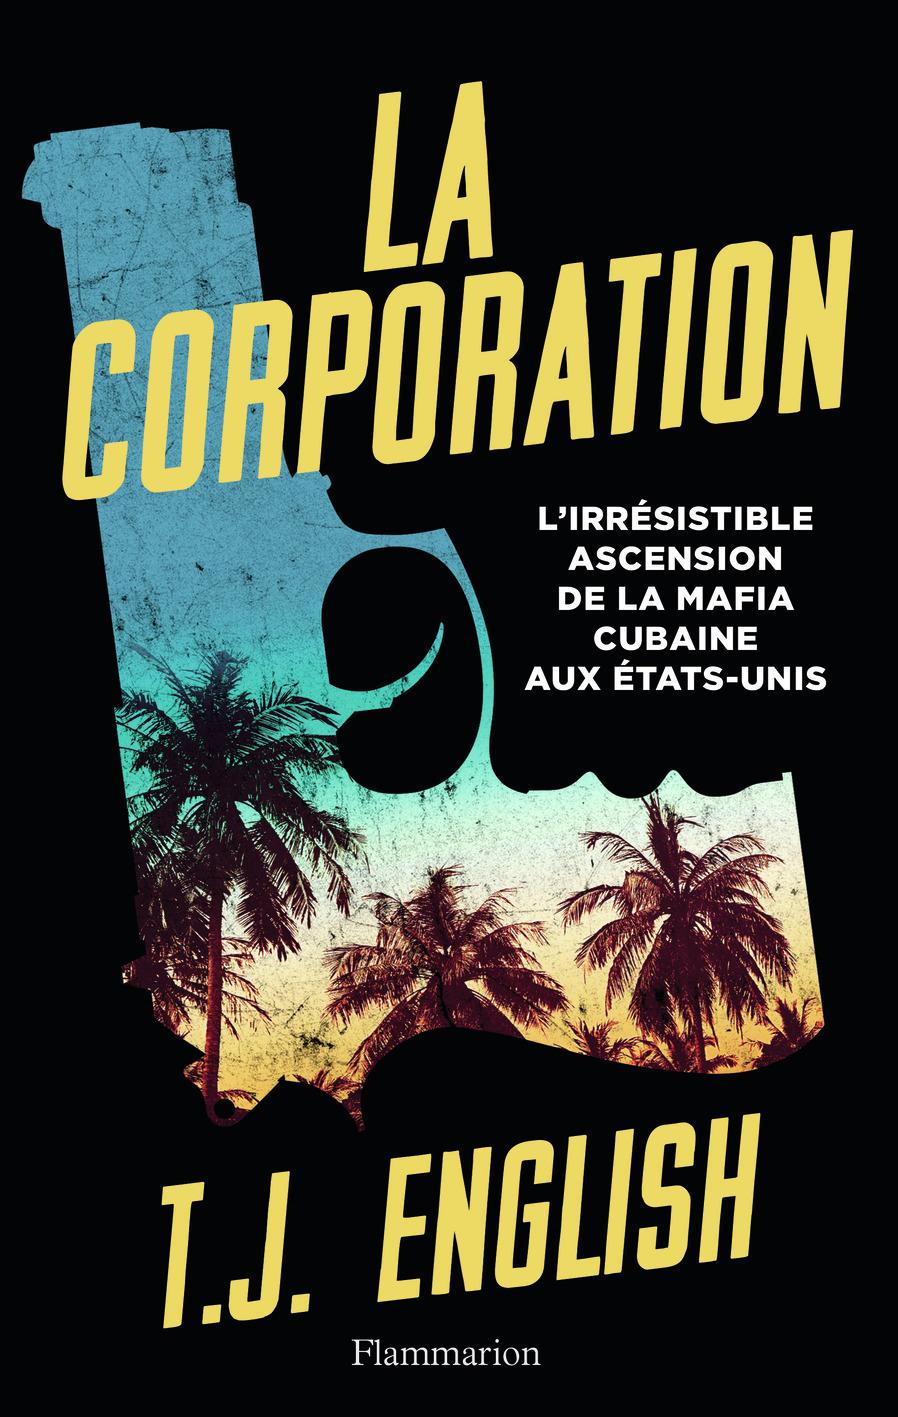 La Corporation